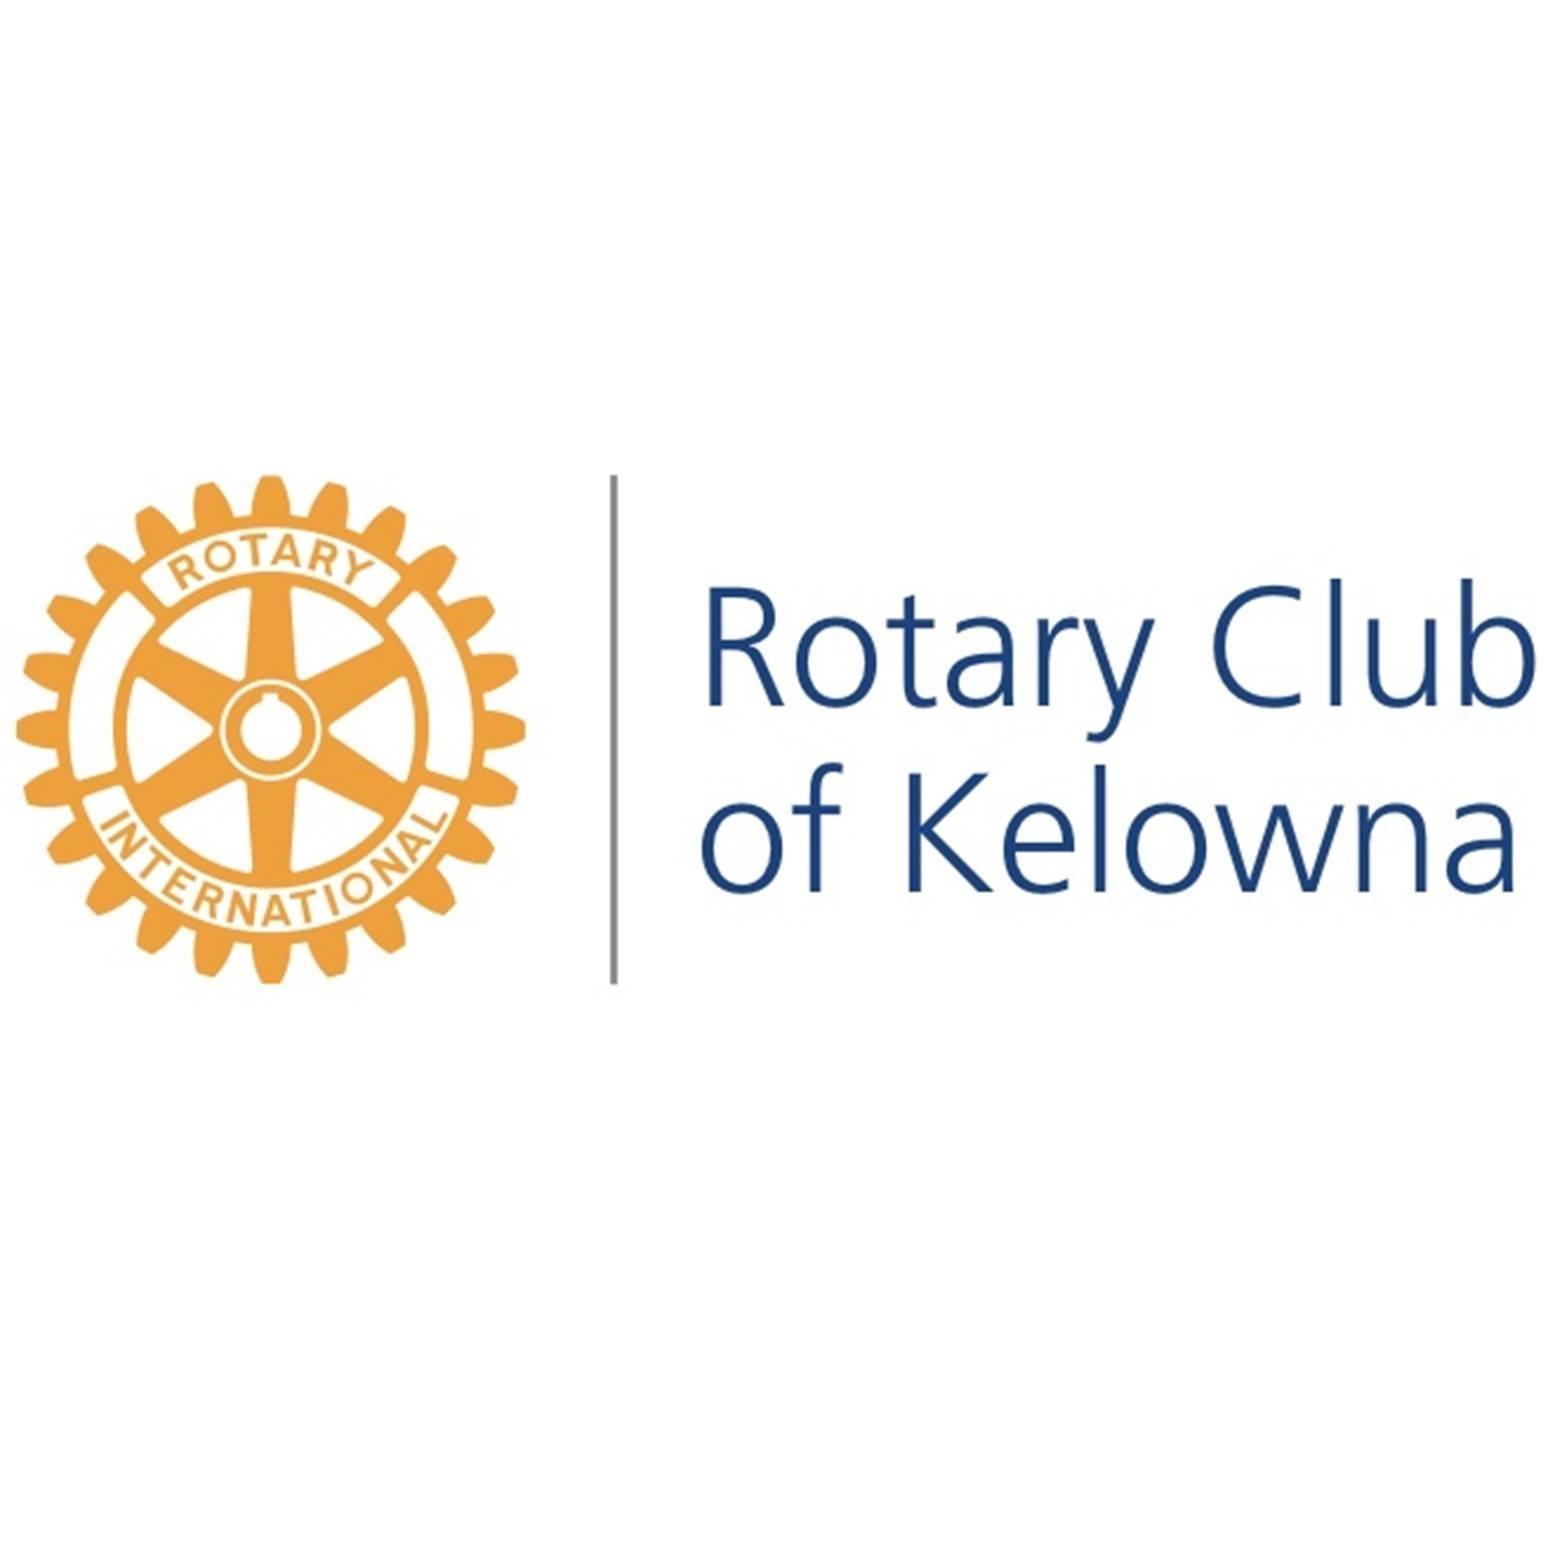 Rotary Club of Kelowna